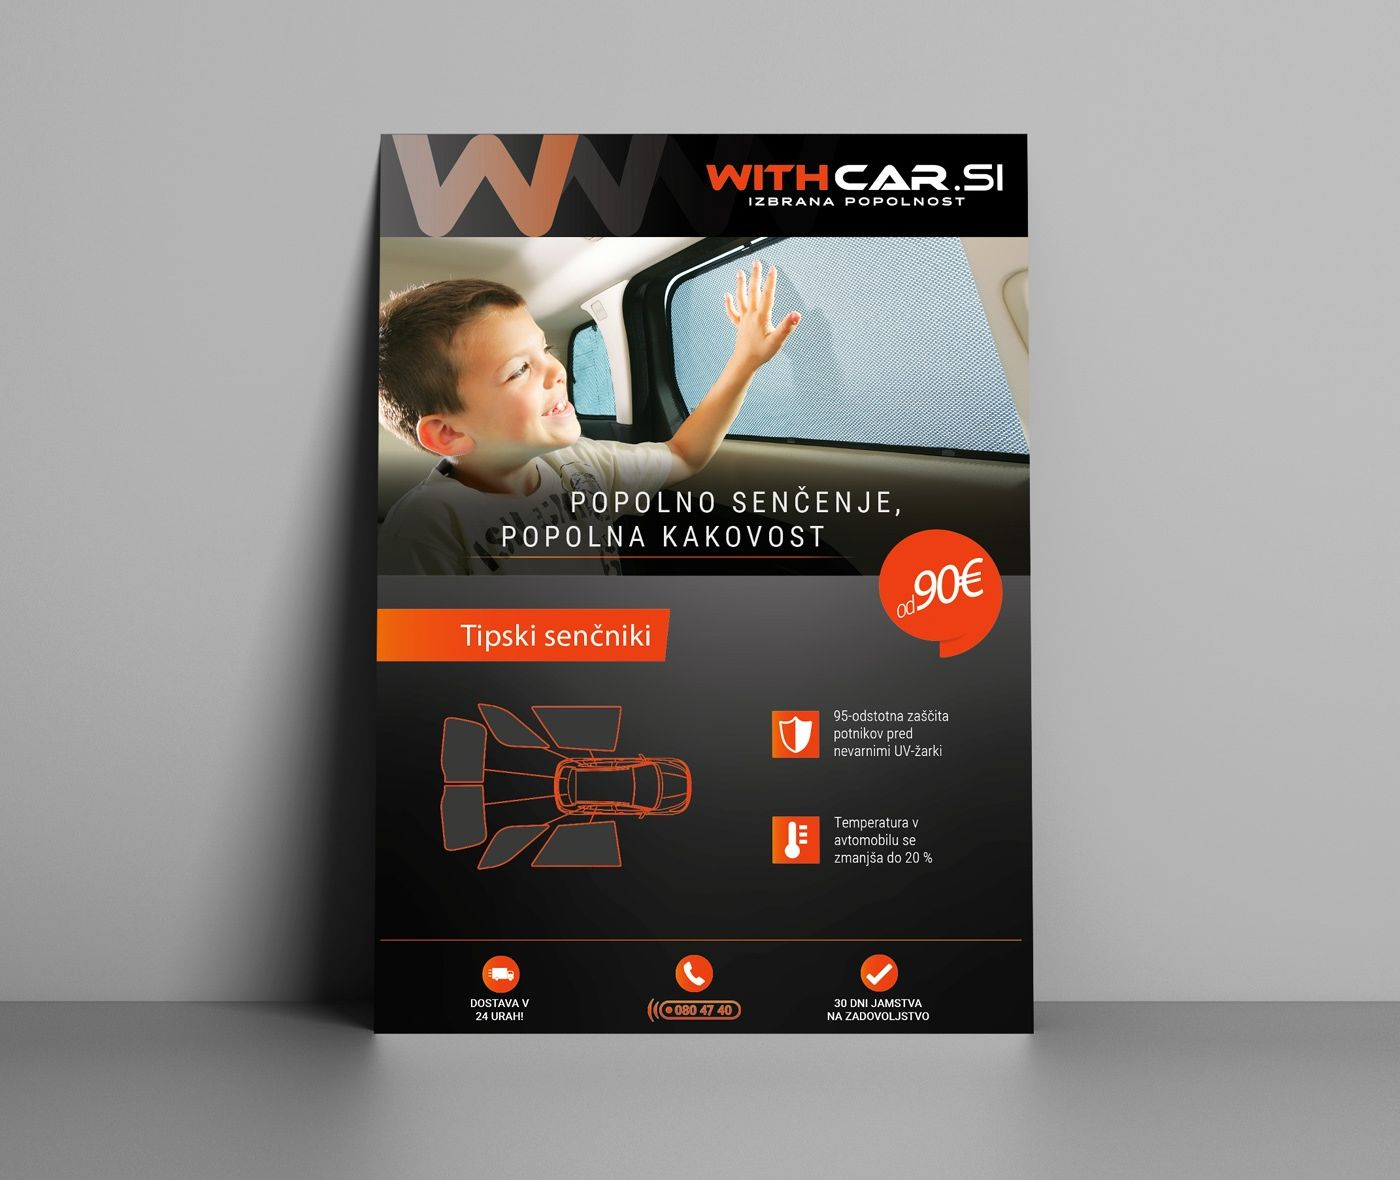 Withcar_poster_pokoncni